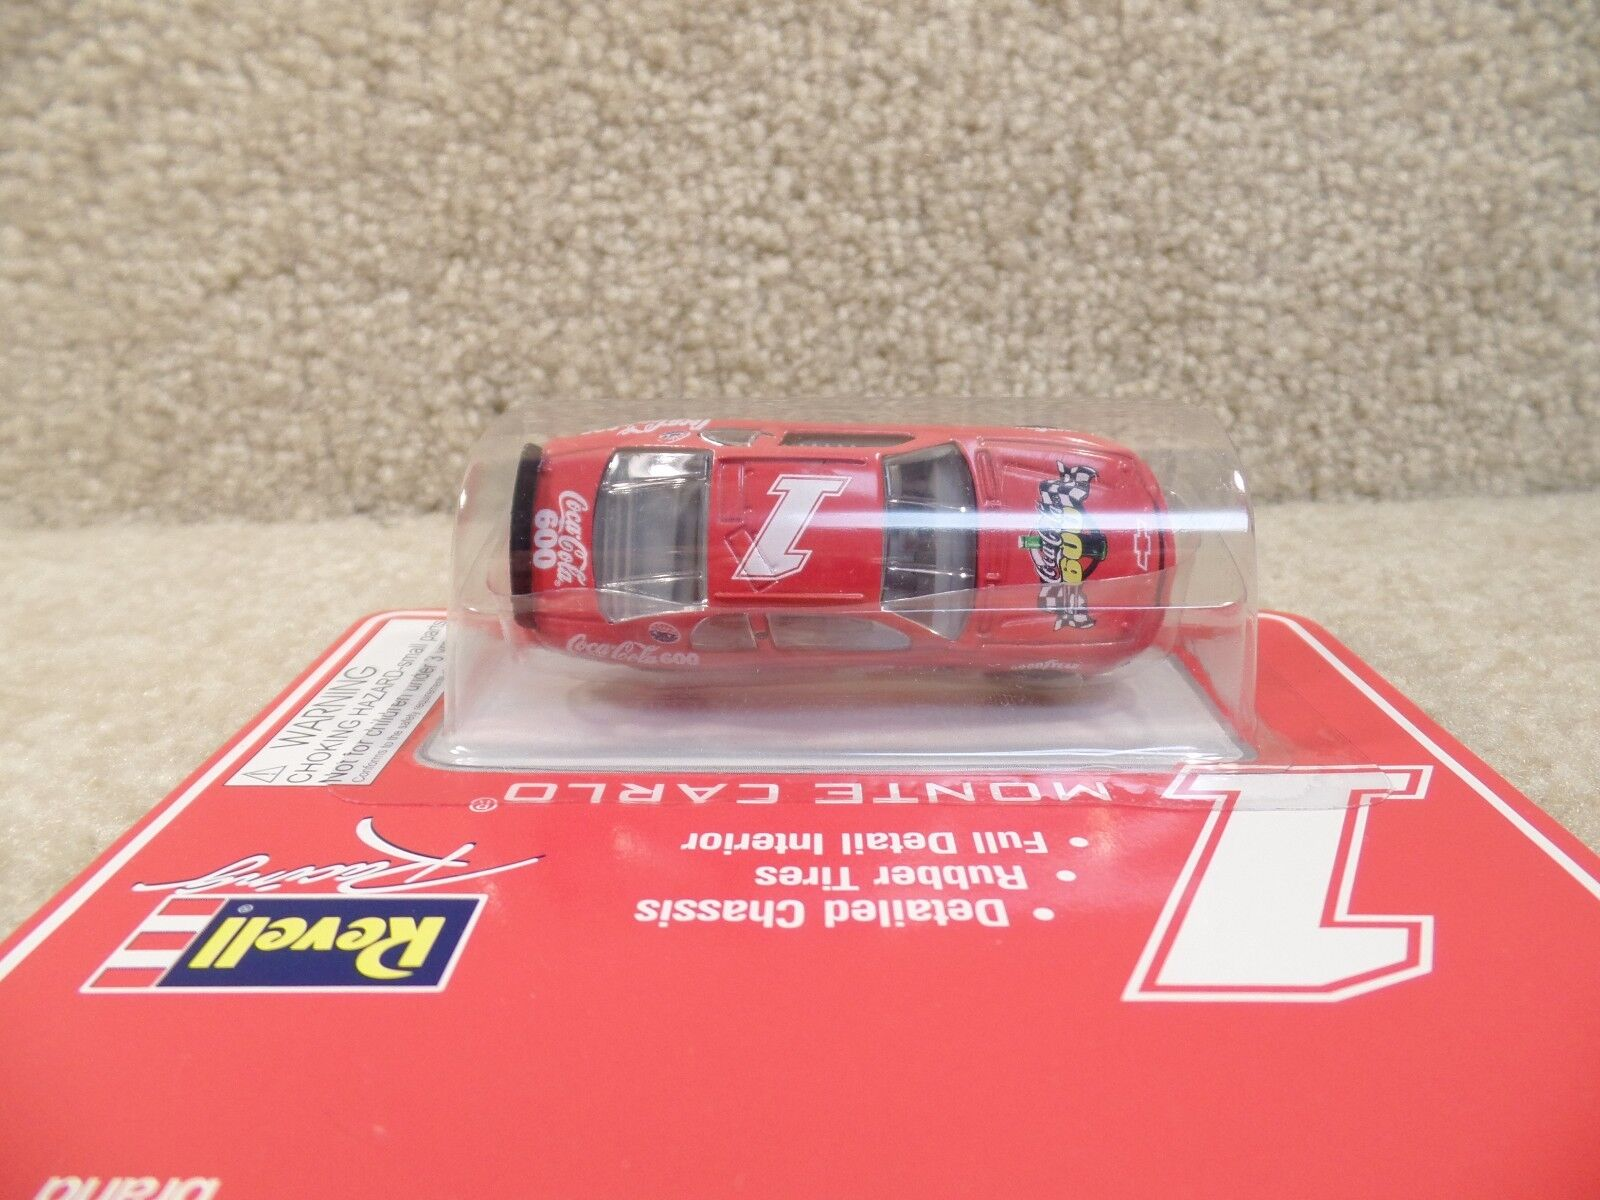 New 1997 Revell 1:64 Scale Diecast NASCAR Coca Cola Coke Monte Carlo Pace Car b